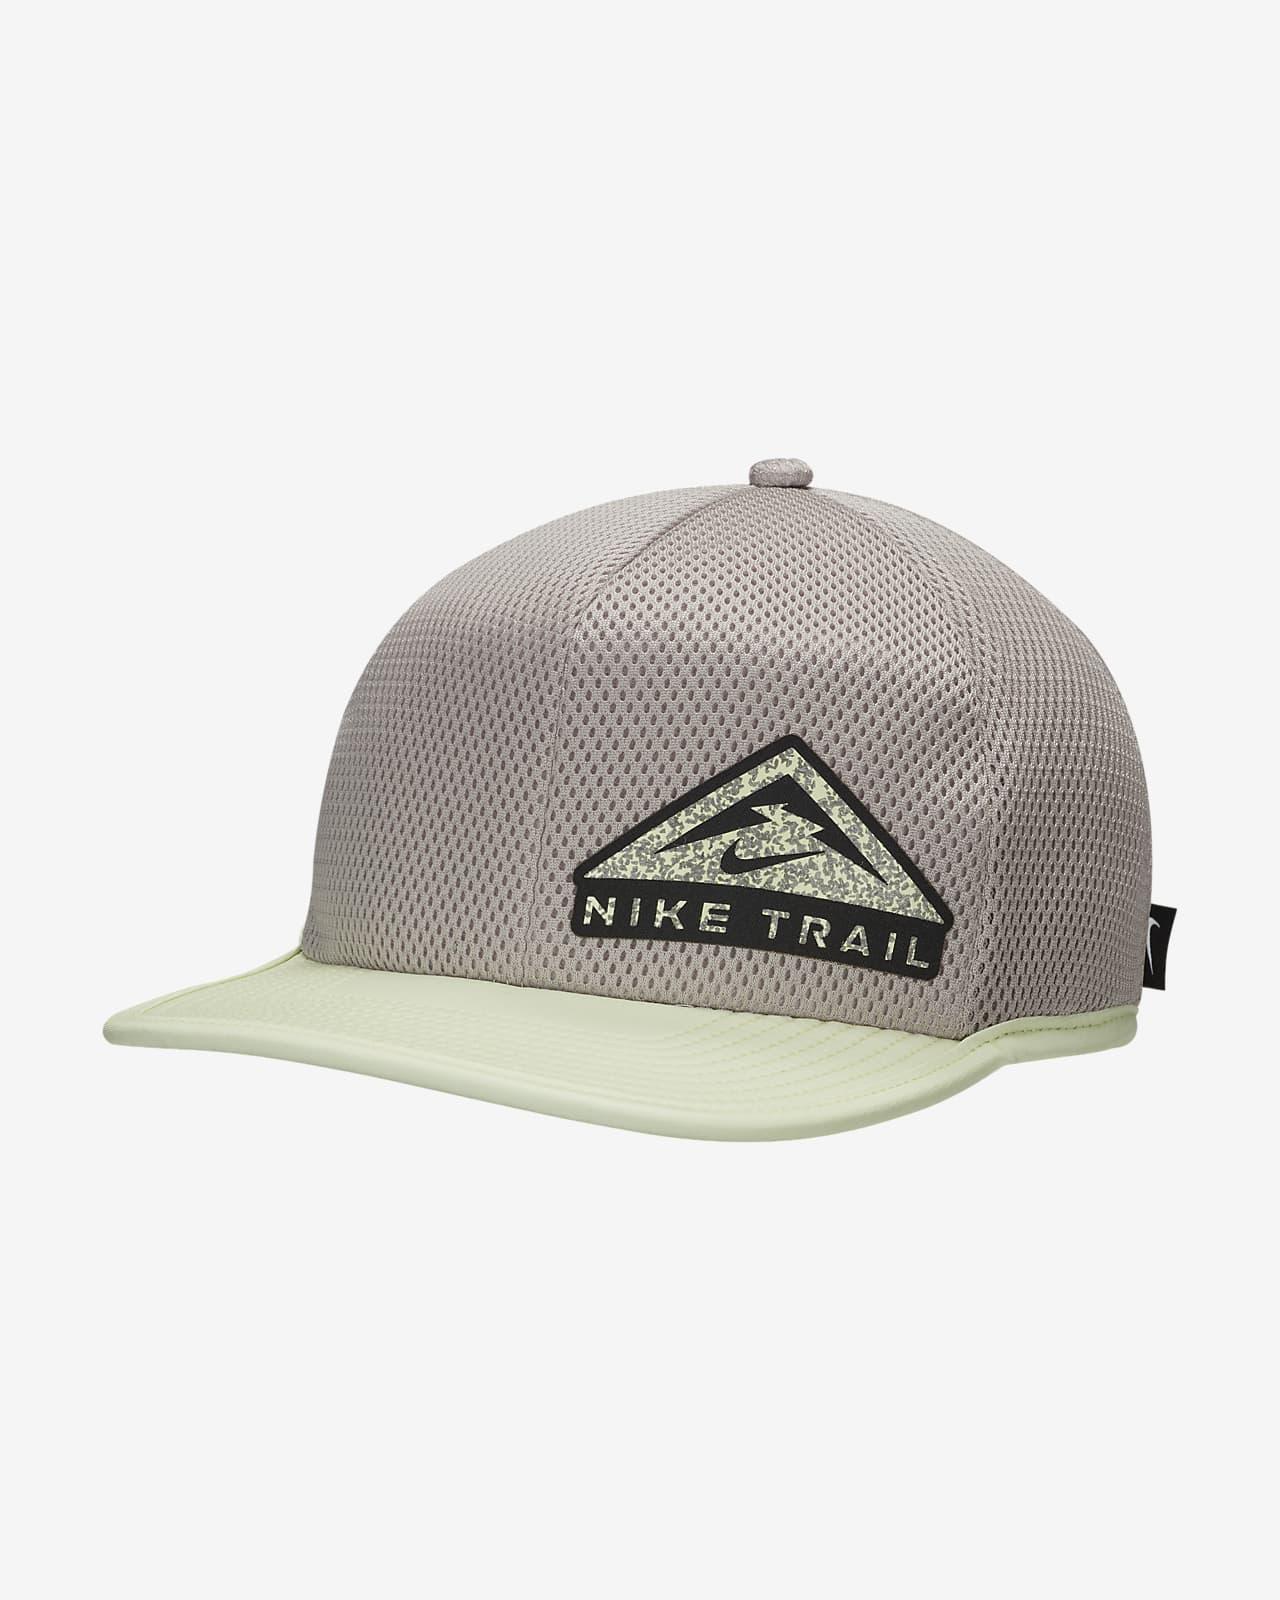 Casquette de trail Nike Dri-FIT Pro